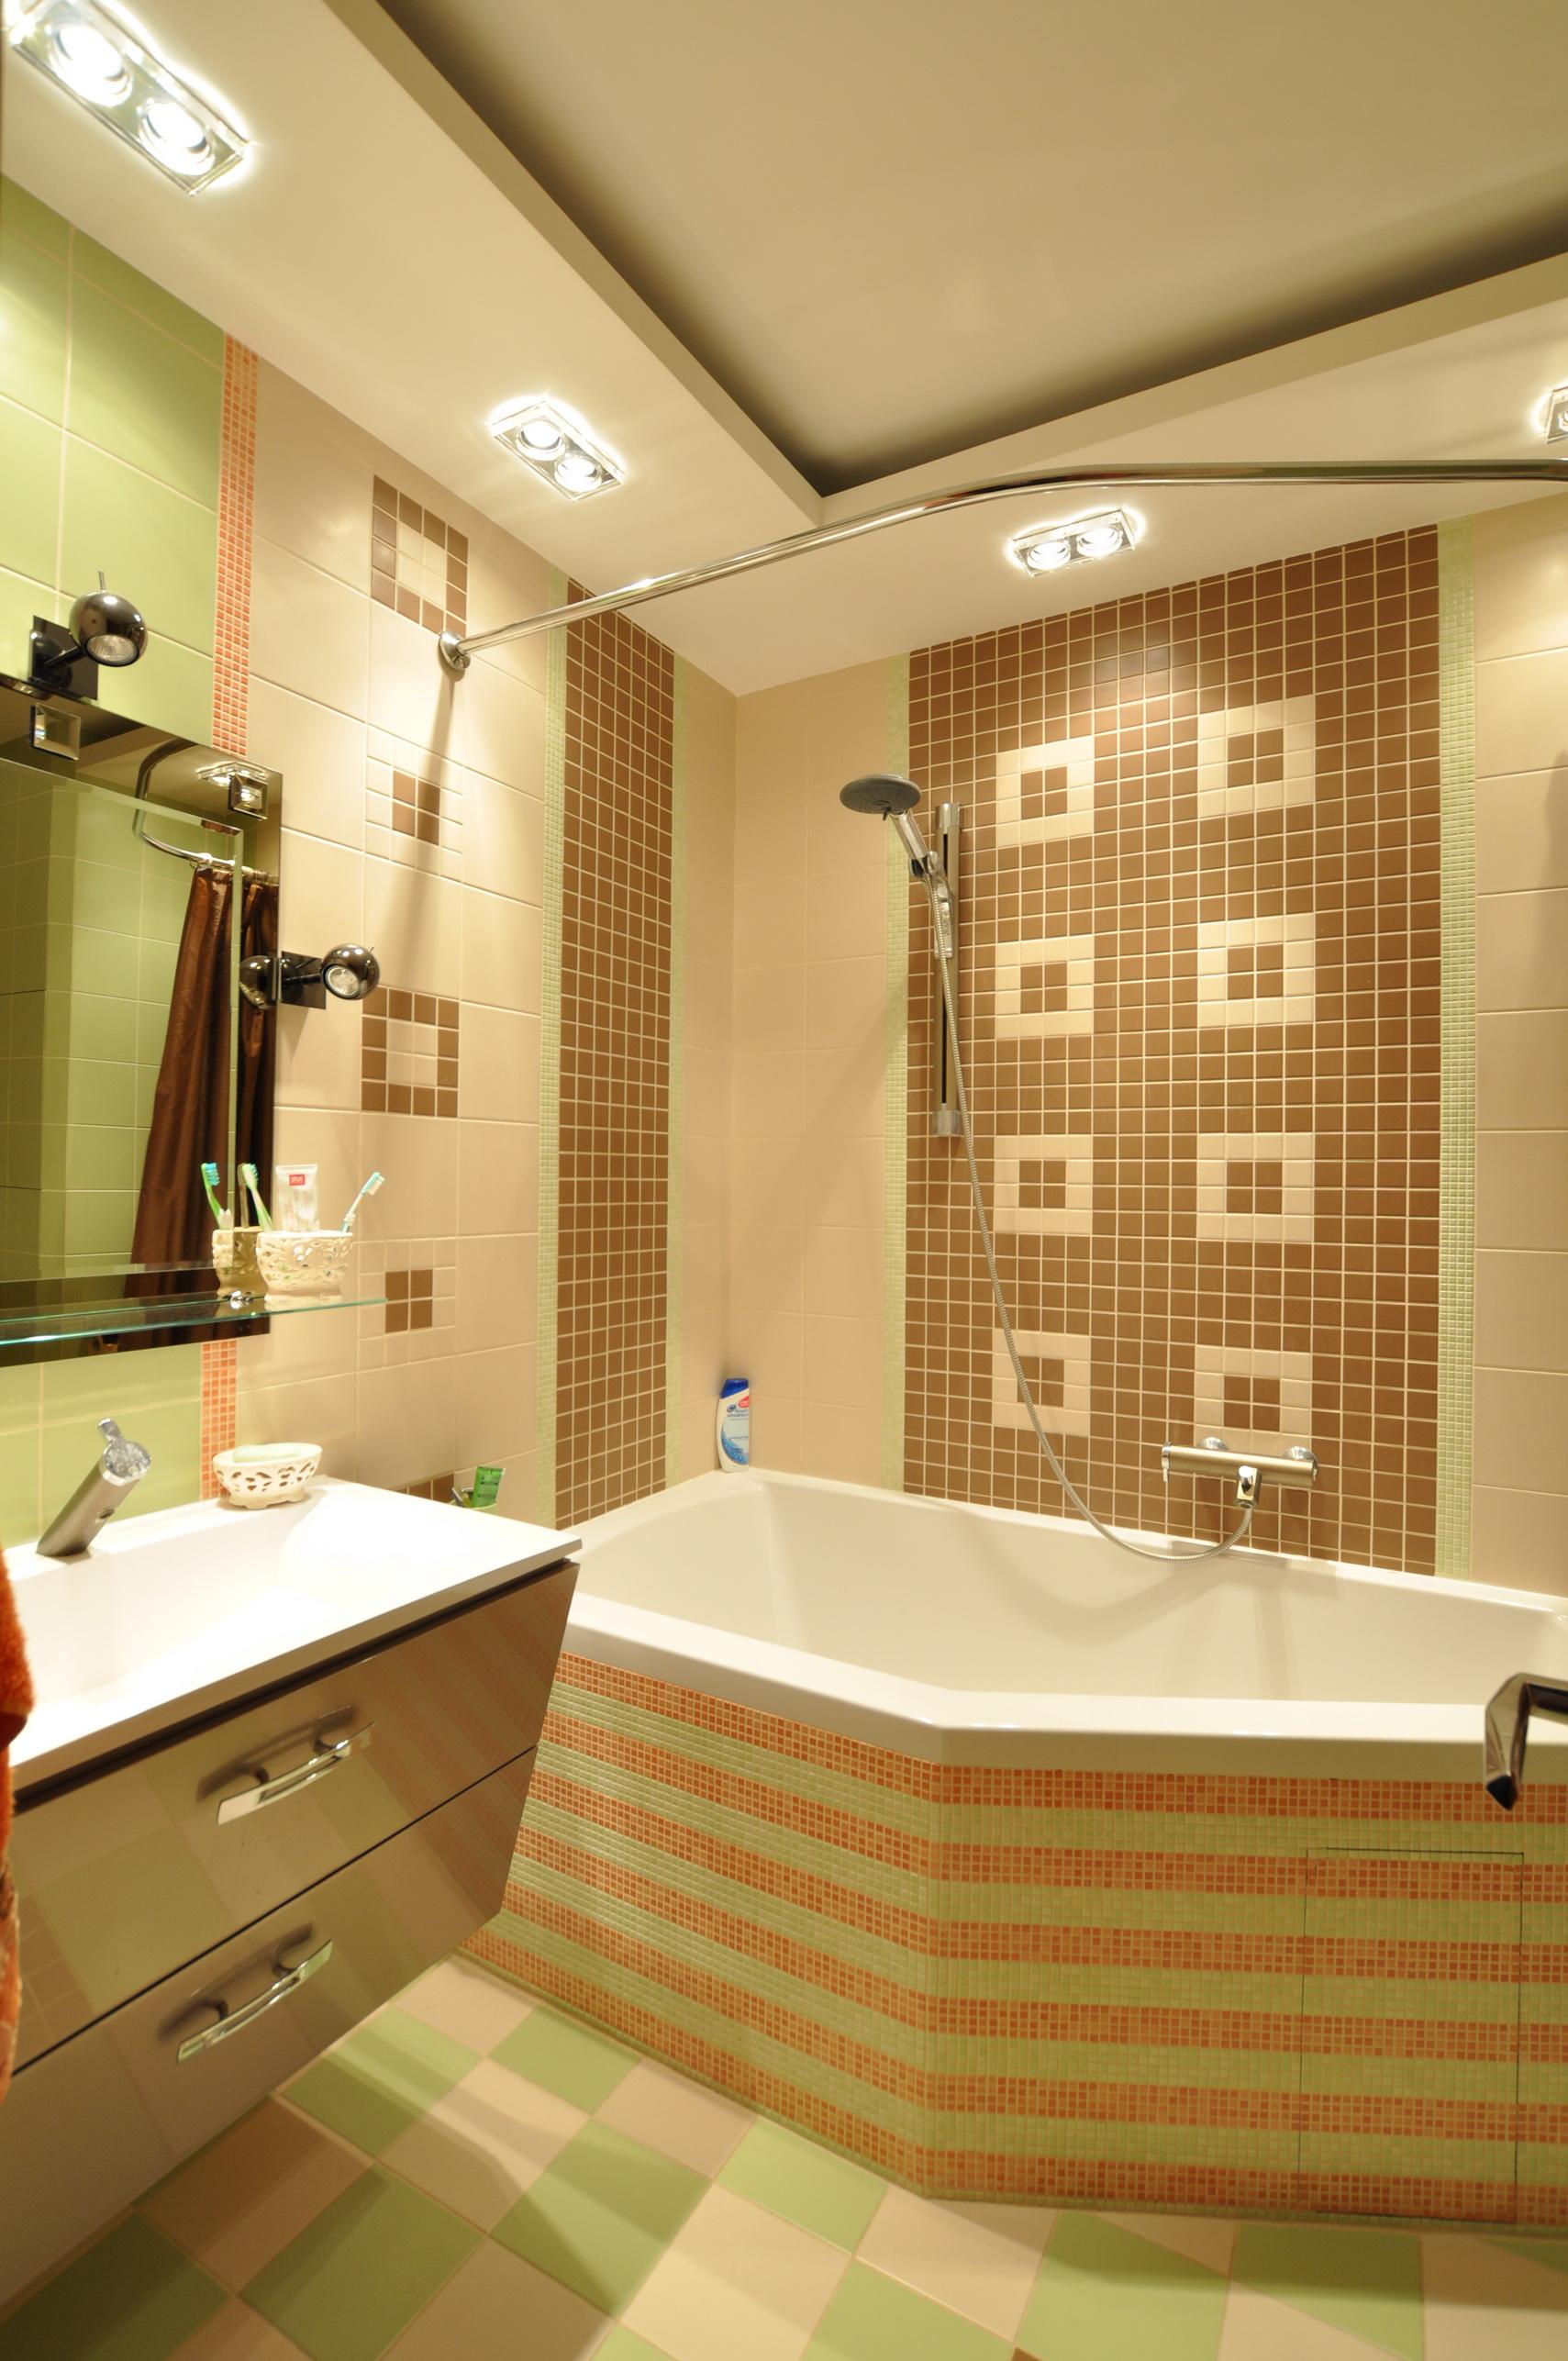 Квартира на ул. Одесская S=55 кв м. Ванная.